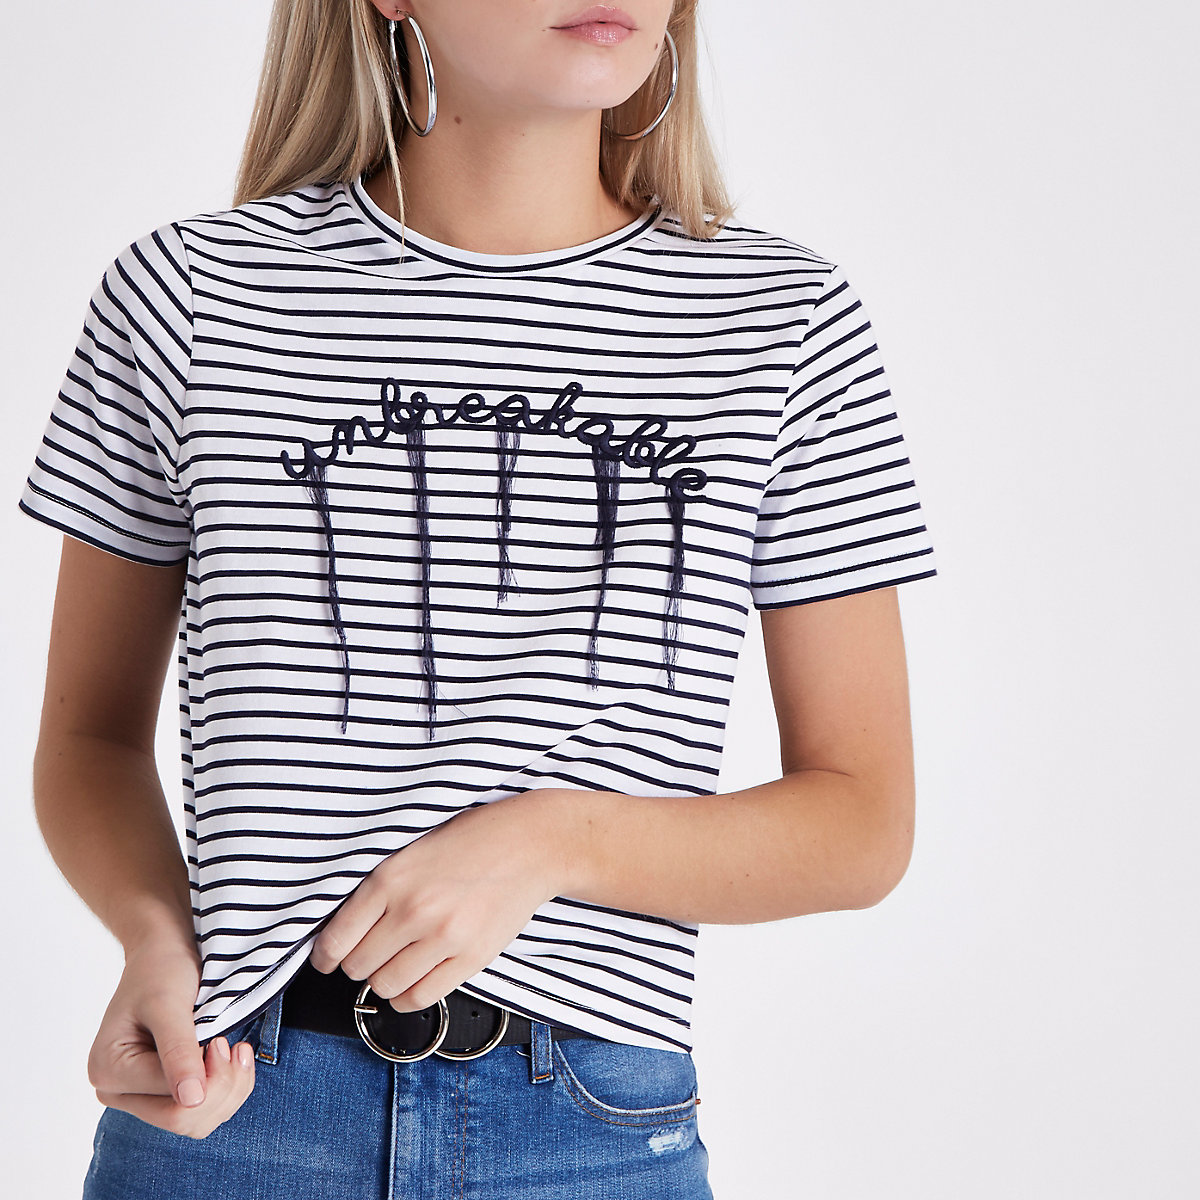 Petite navy stripe 'unbreakable' T-shirt